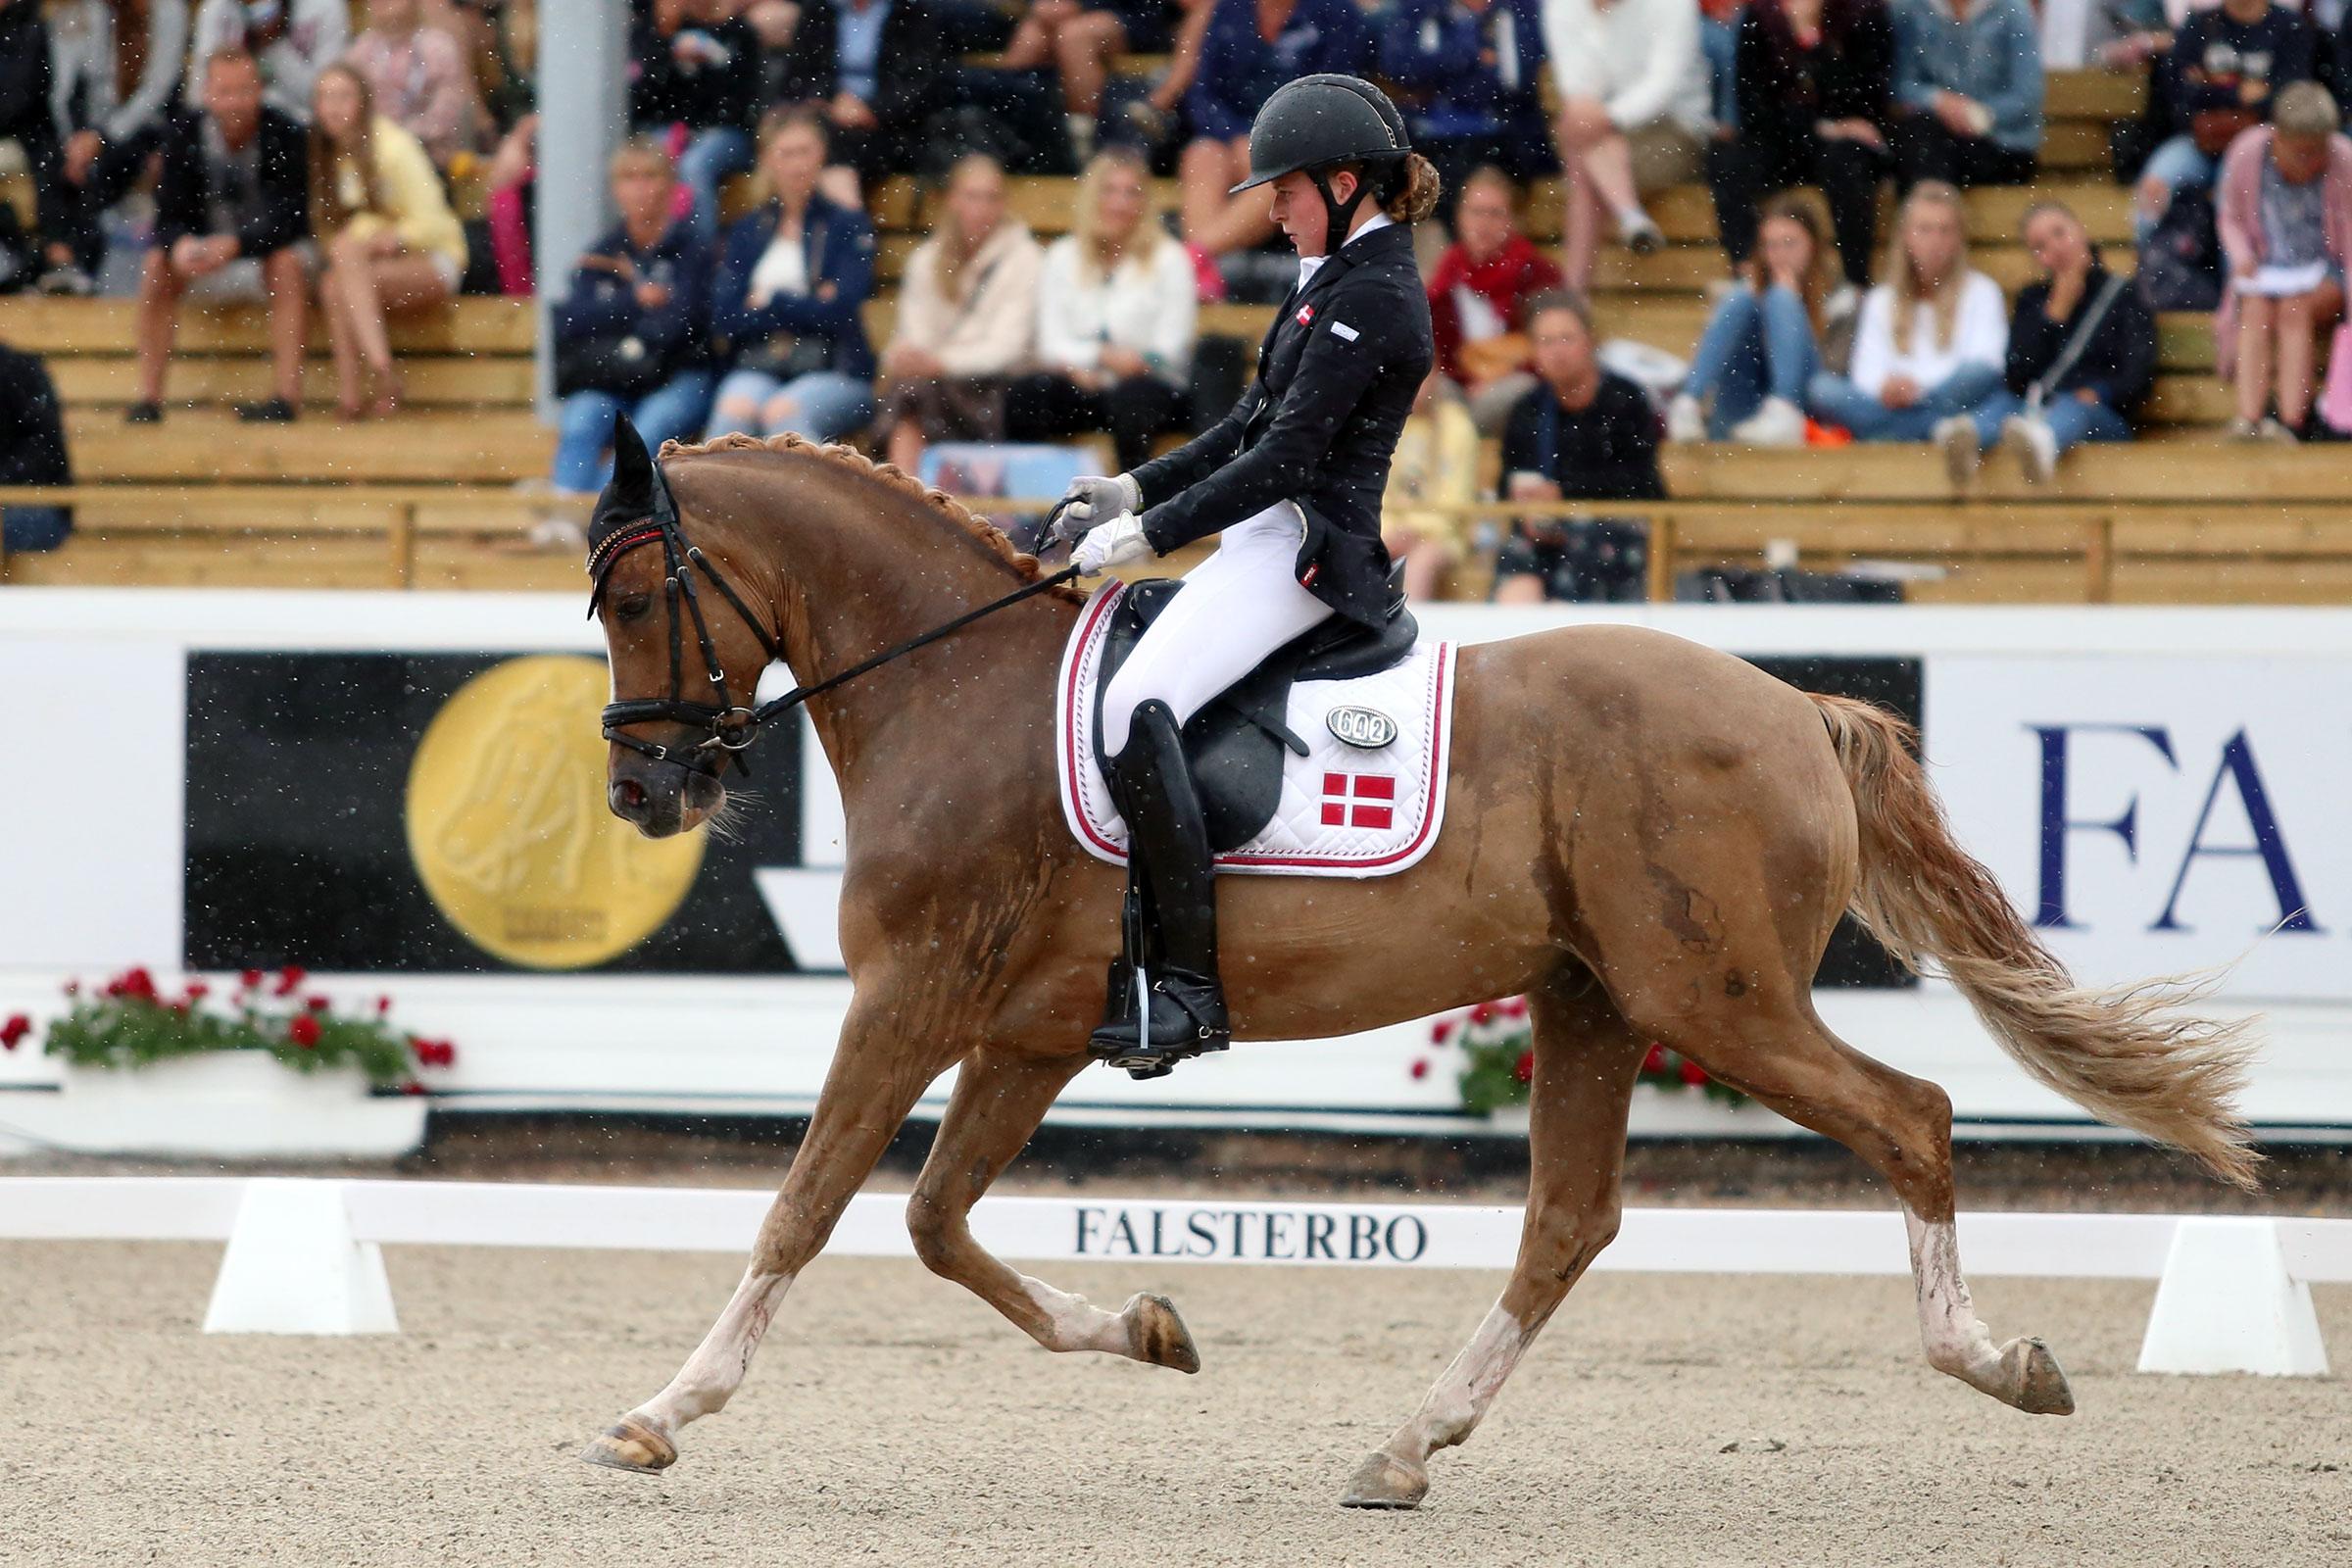 Mathilde Kalstrup Jensen - Cake Royal (val f-11 e Casino Royale KWE, uppf Sabine Goldberg) 70,041%